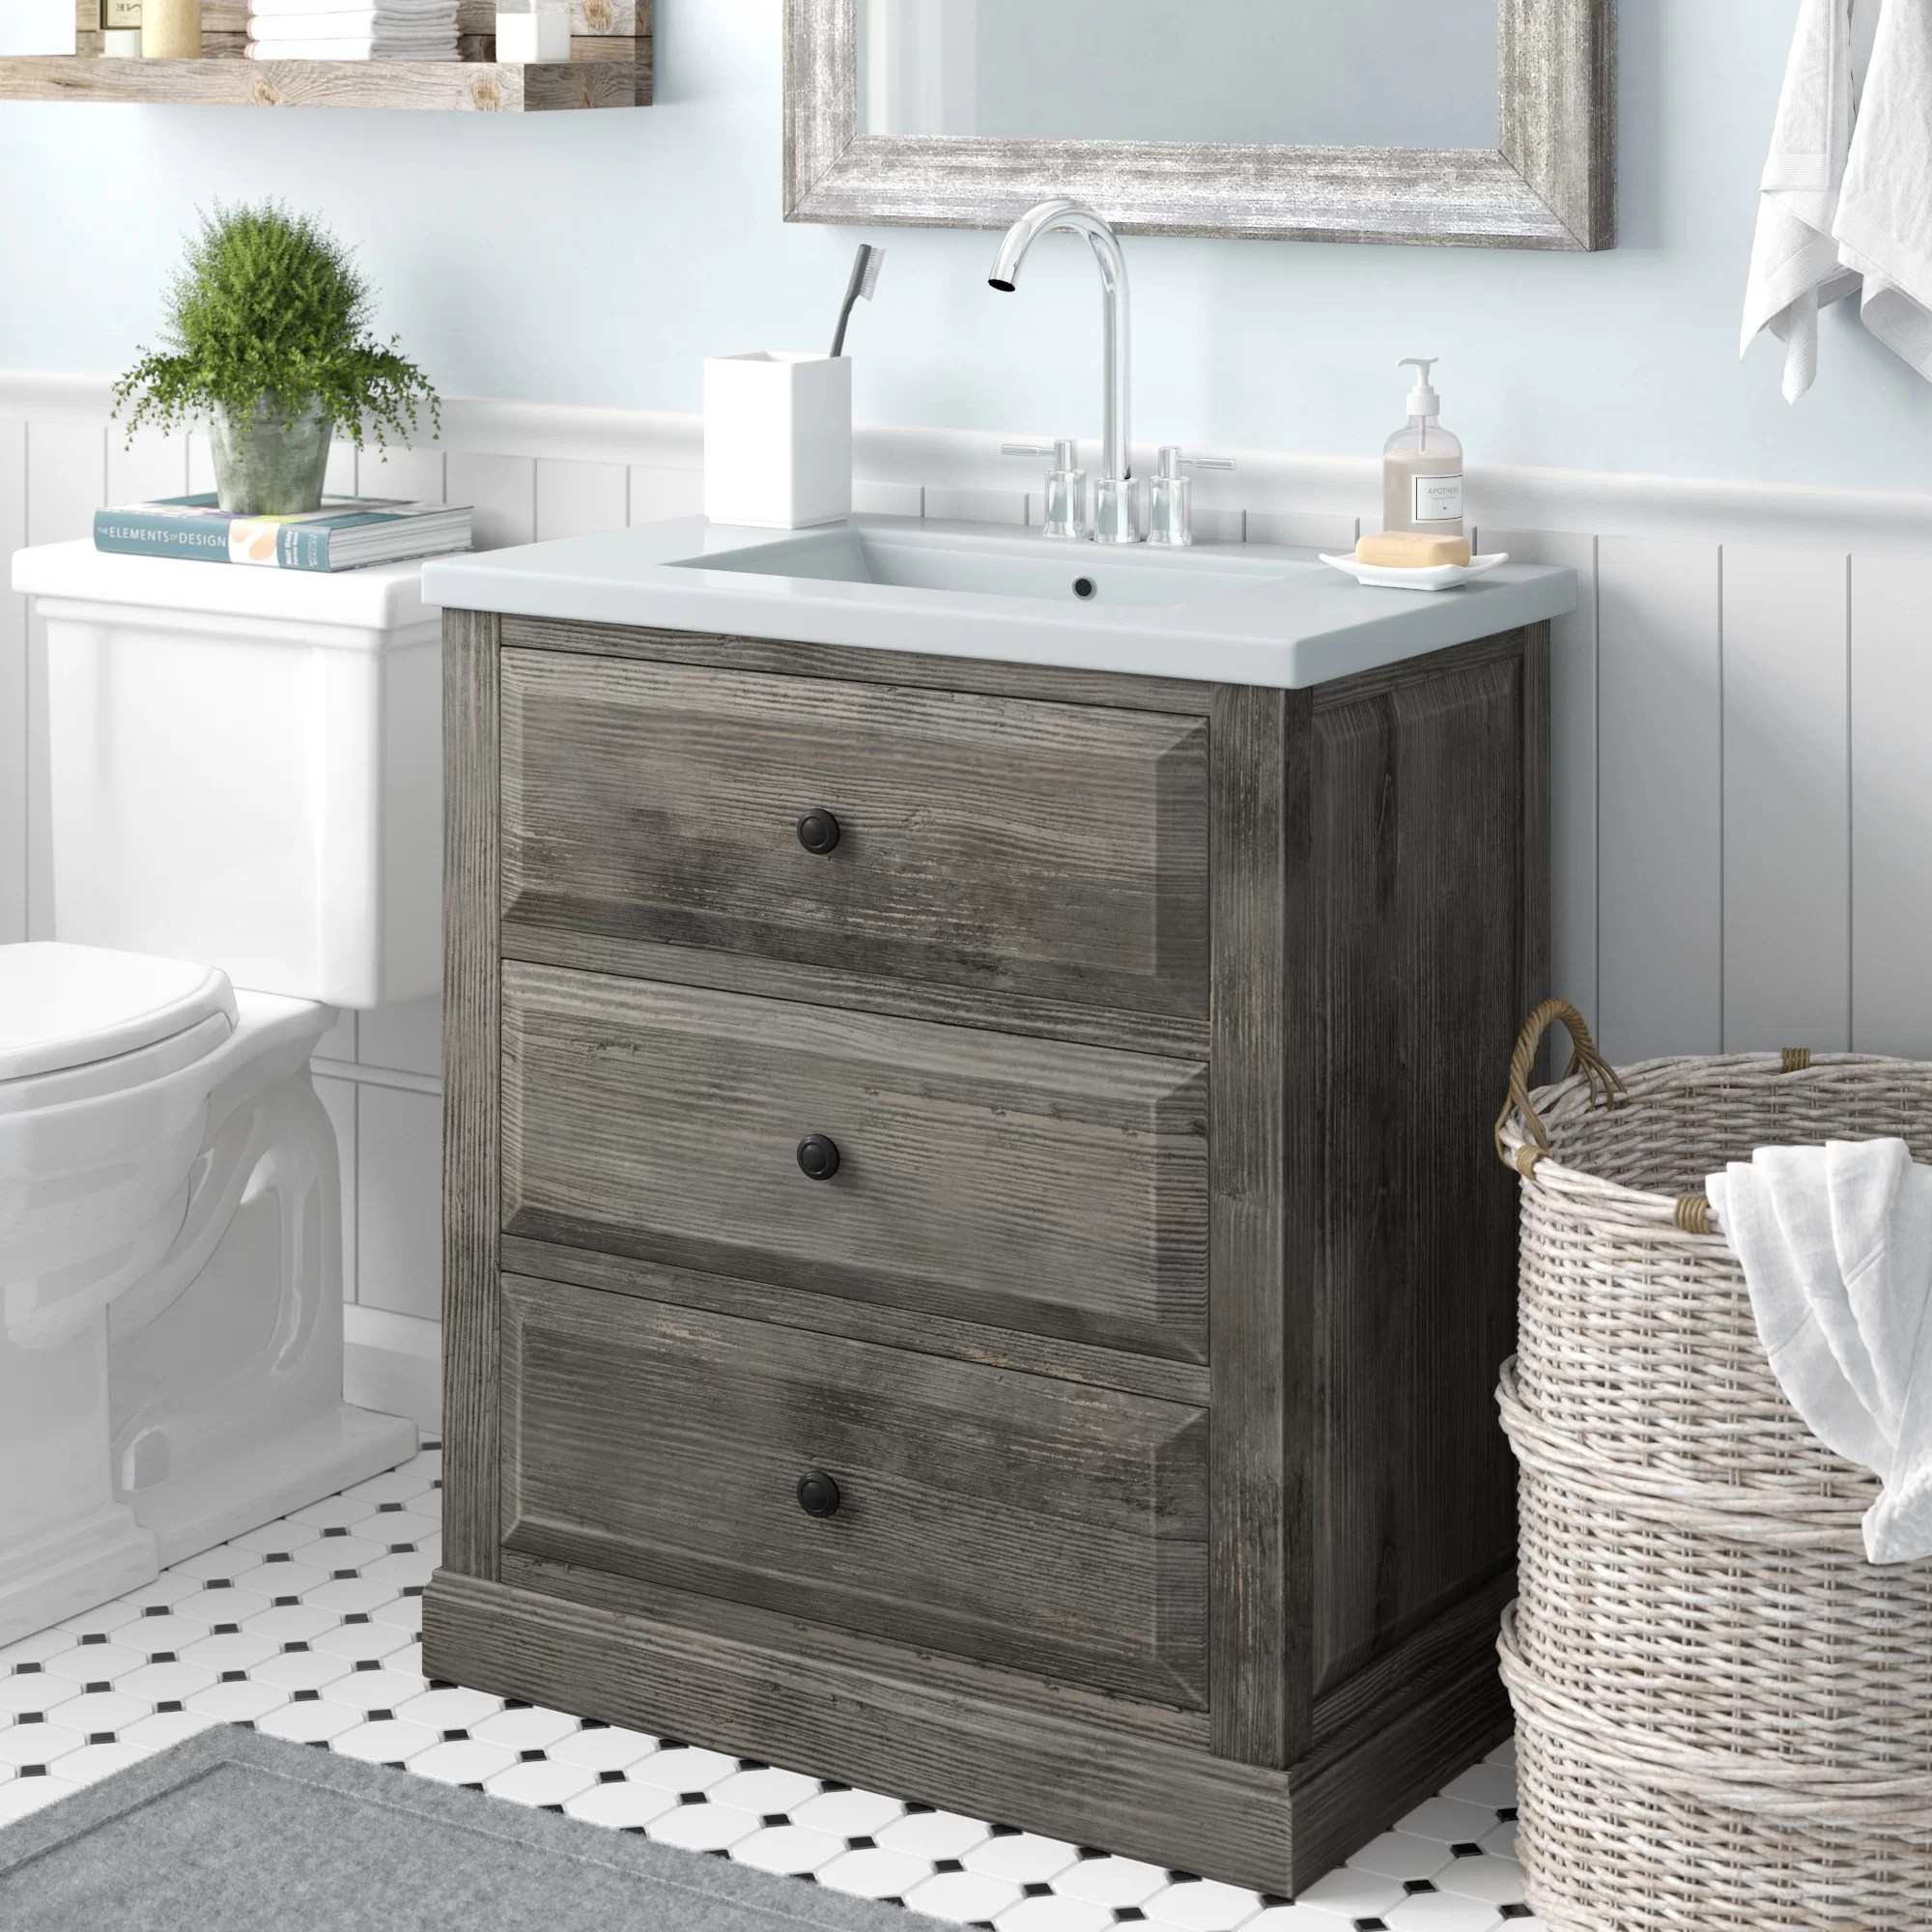 aalisha 30 single sink bathroom vanity set